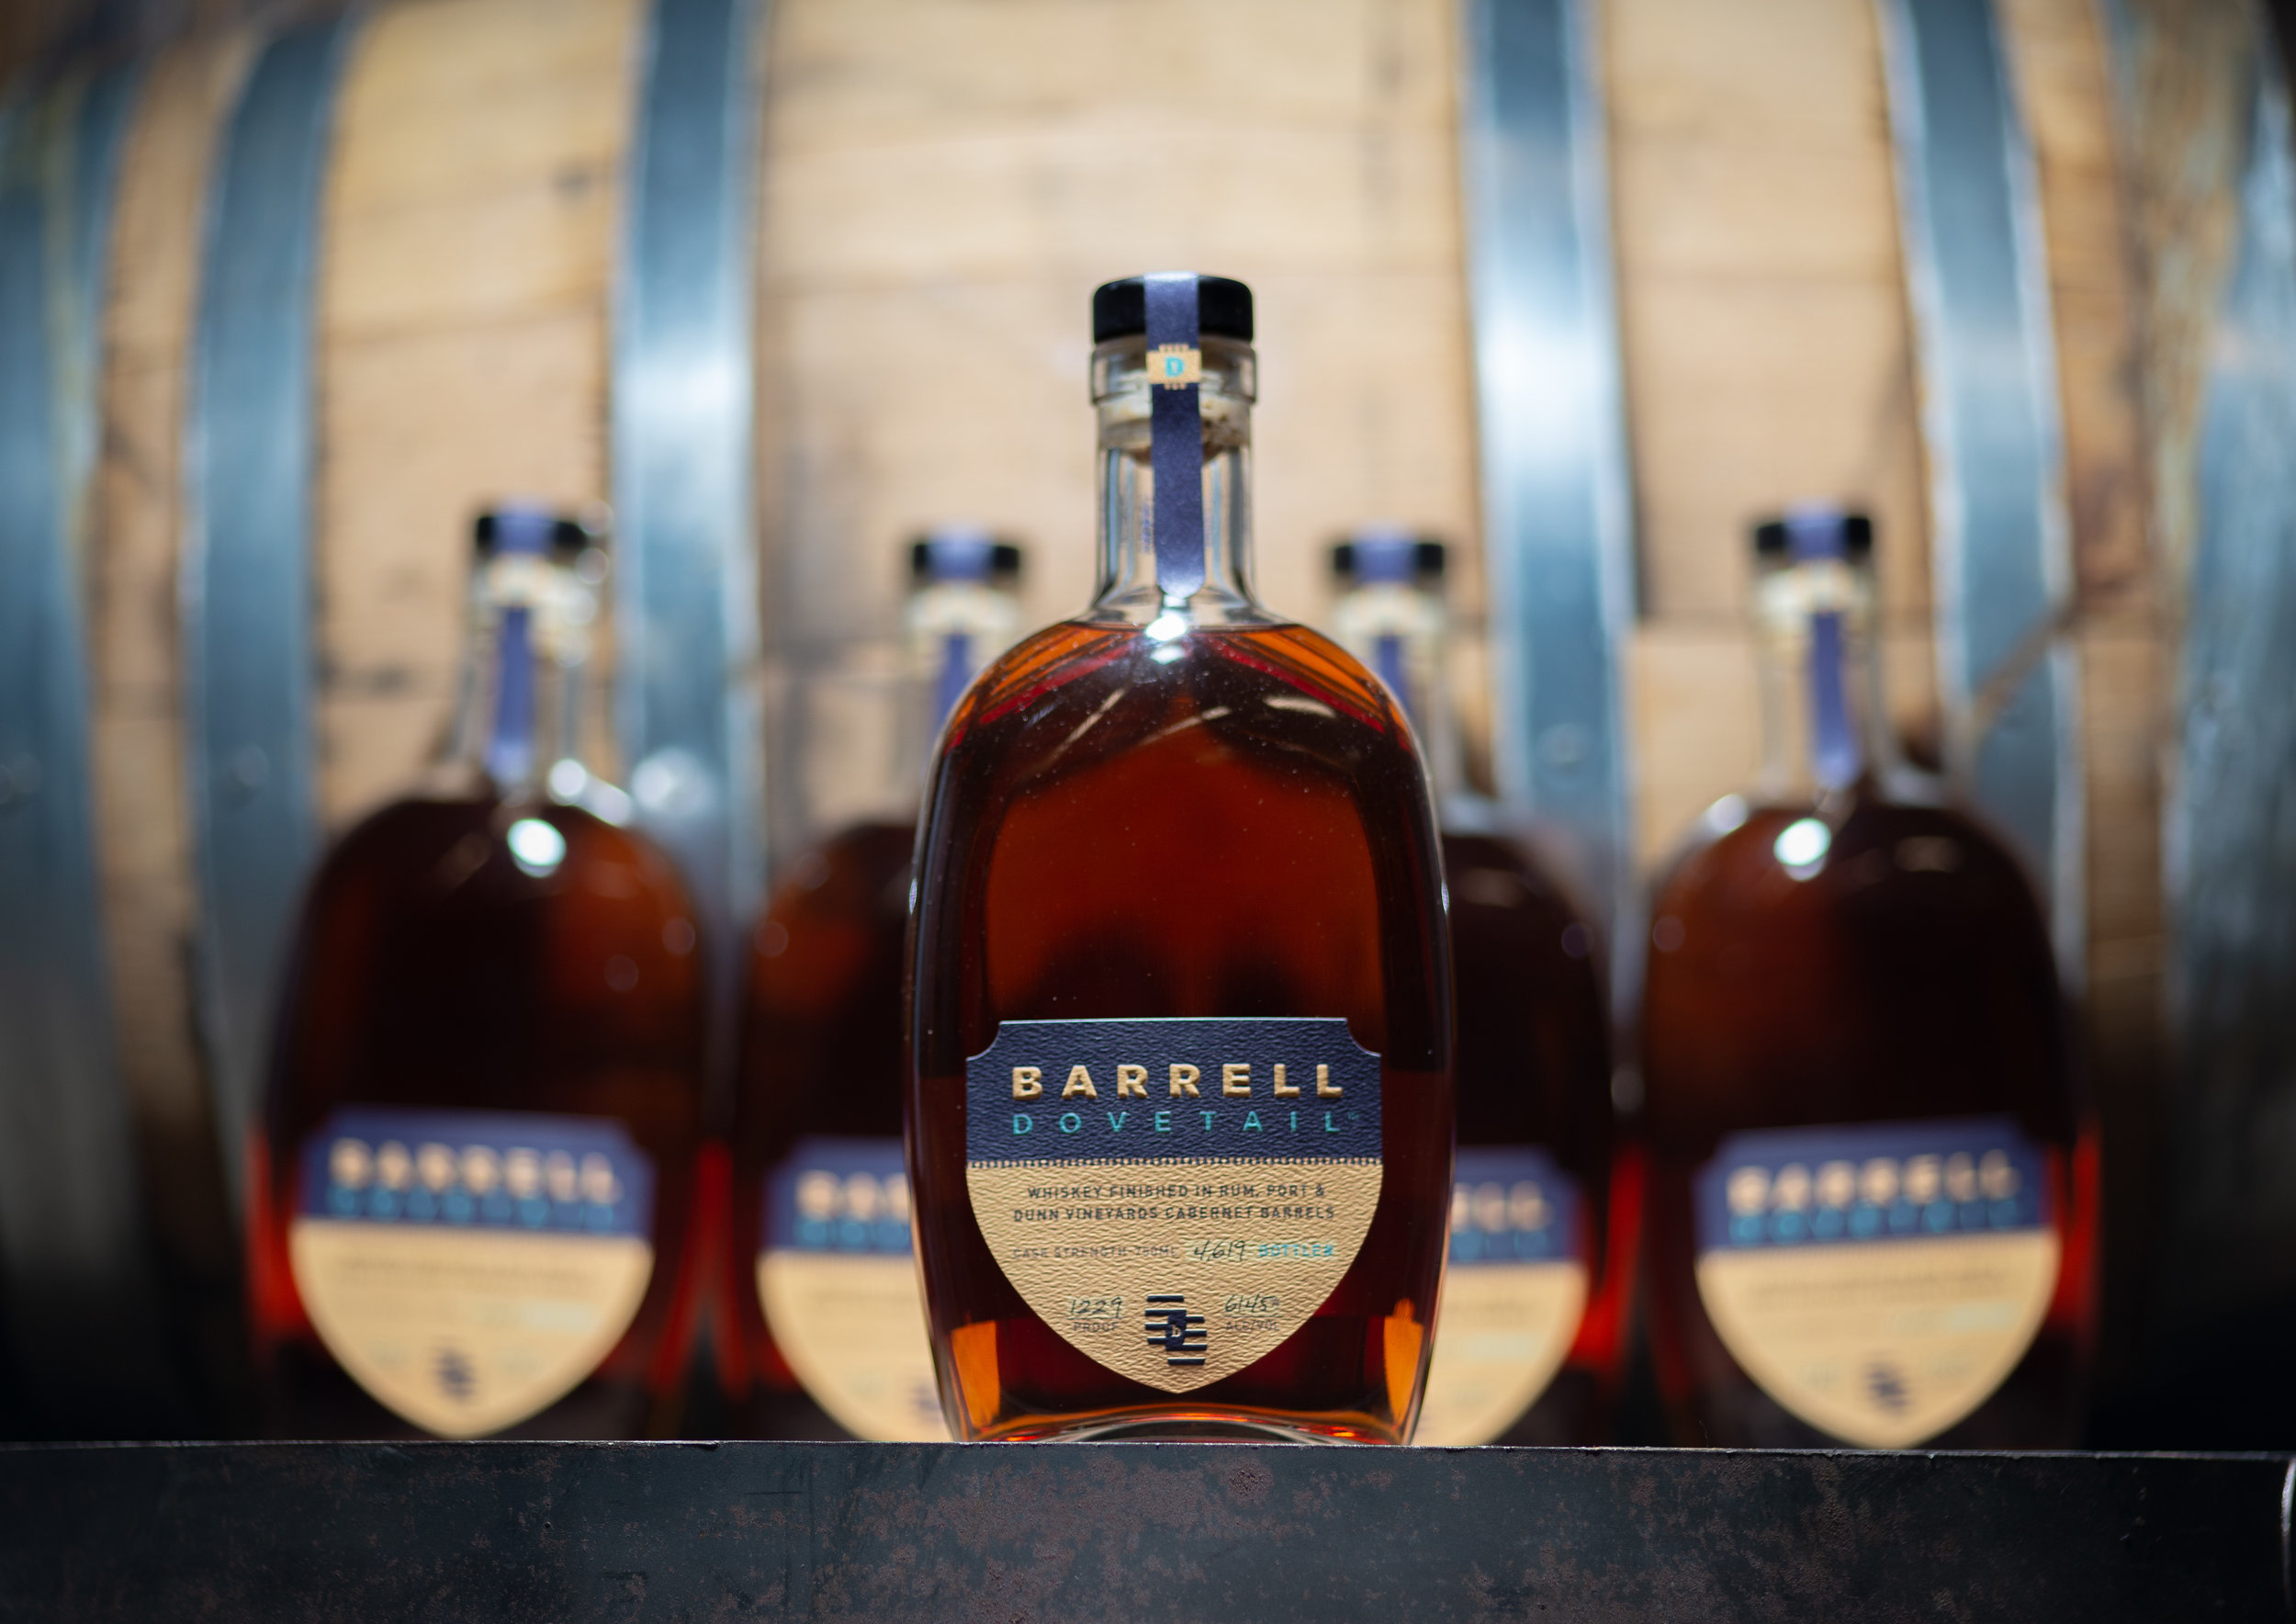 barrel-dovetail.jpg